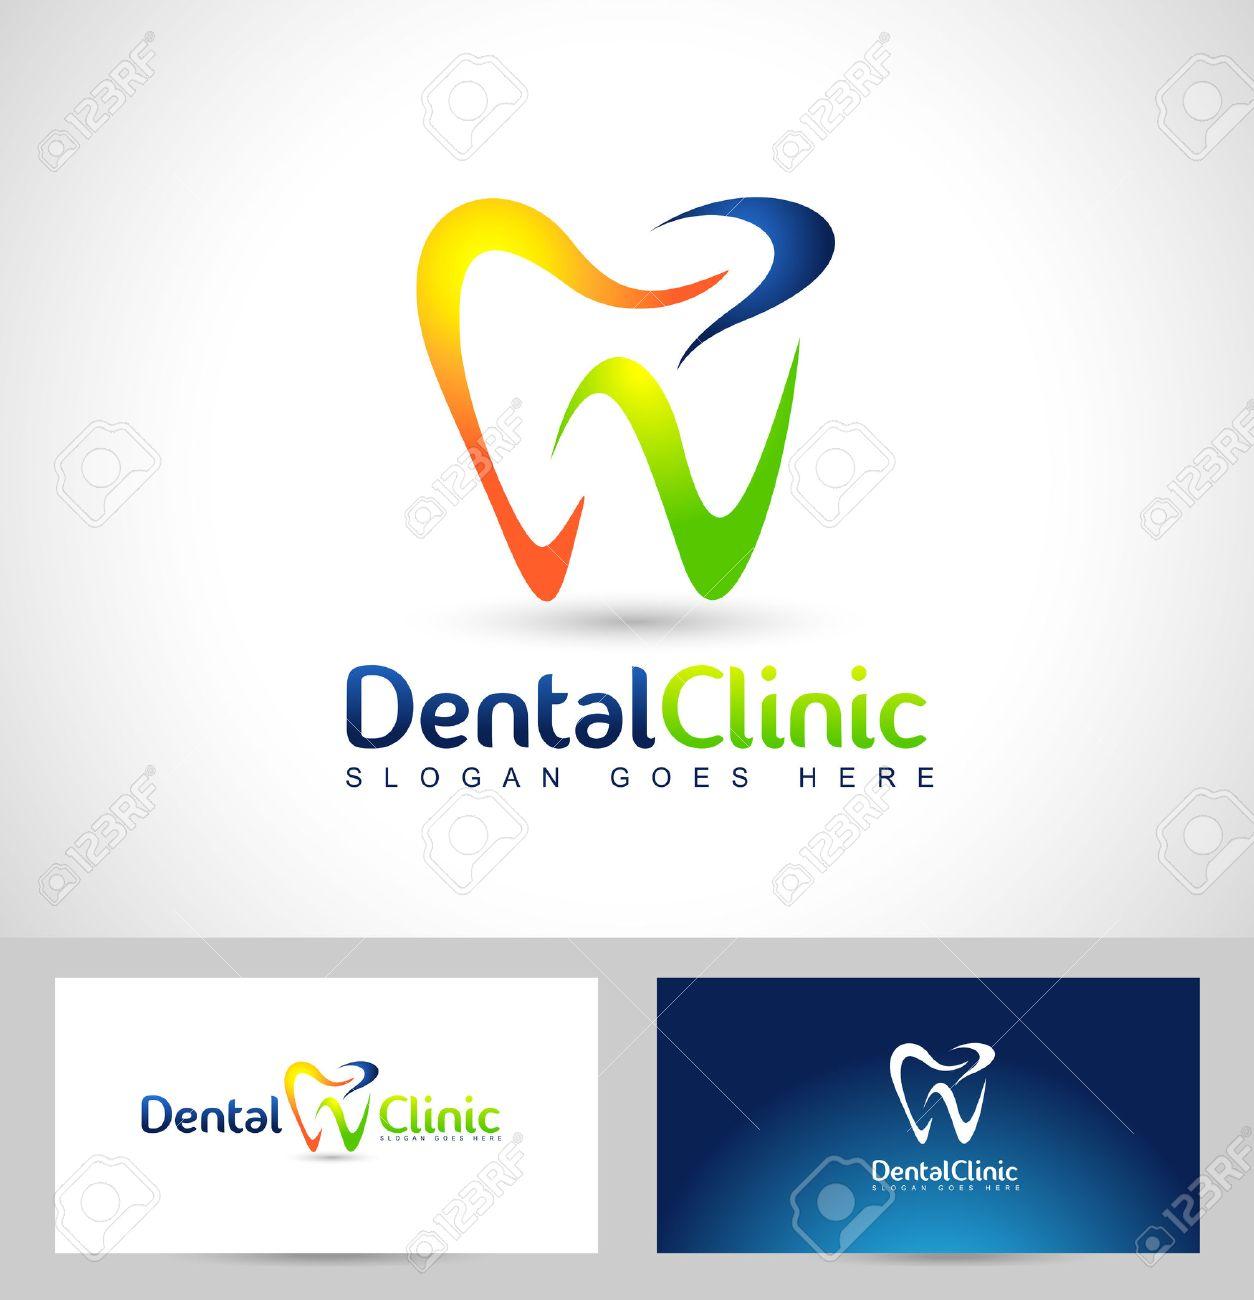 Dental Logo Design. Dentist Logo. Dental Clinic Creative Company ...